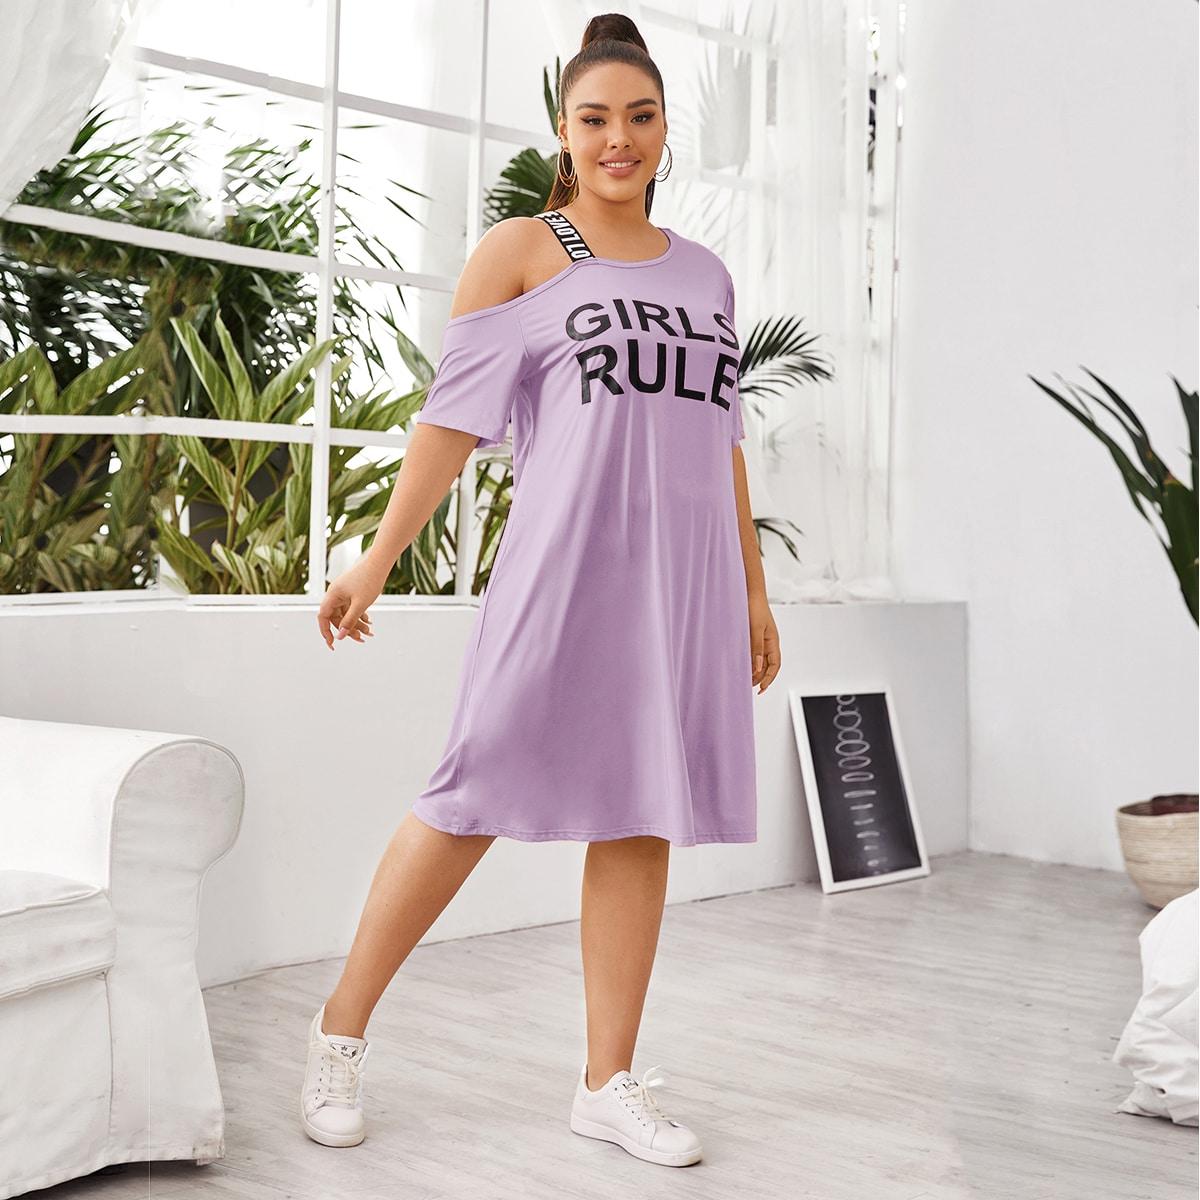 shein Lila paars Casual Tekst Grote maat jurk Asymmetrisch